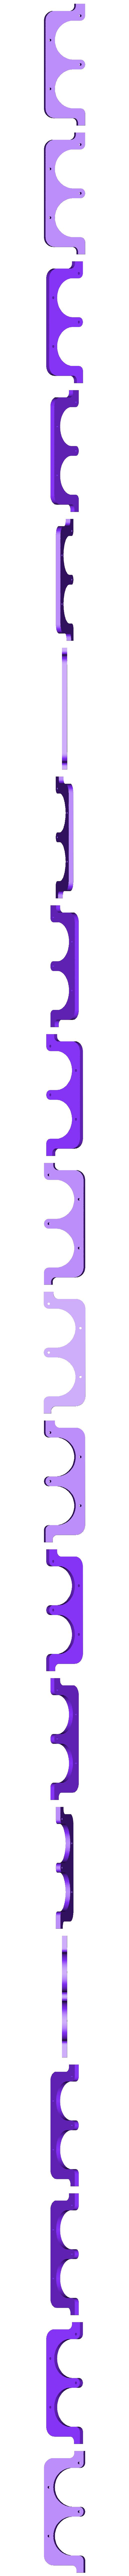 spider_robot.stl Download free STL file 8 legged spider robot • 3D print design, brianbrocken